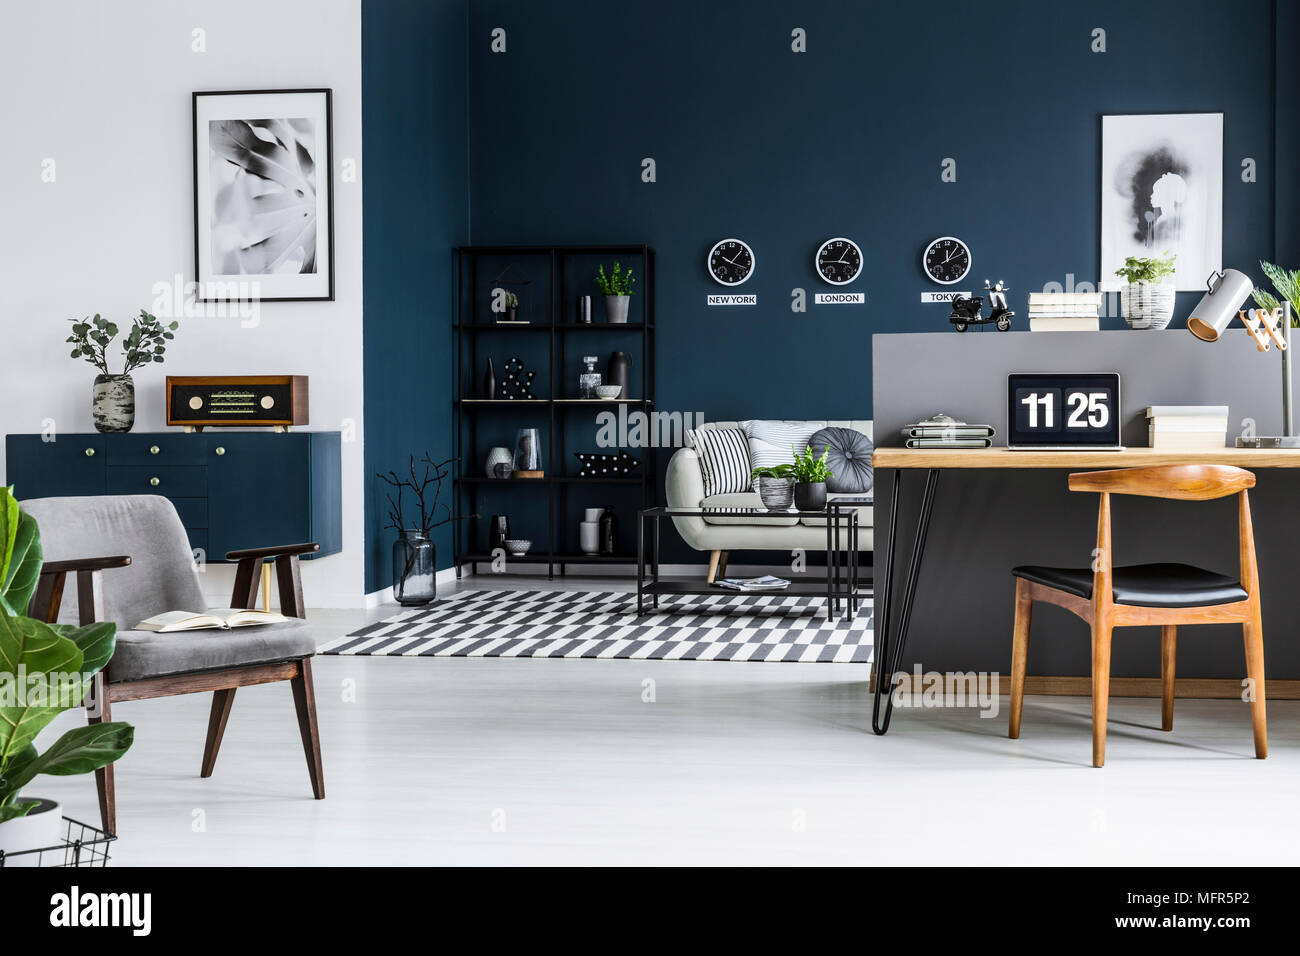 Corner Cabinet Stockfotos & Corner Cabinet Bilder - Alamy